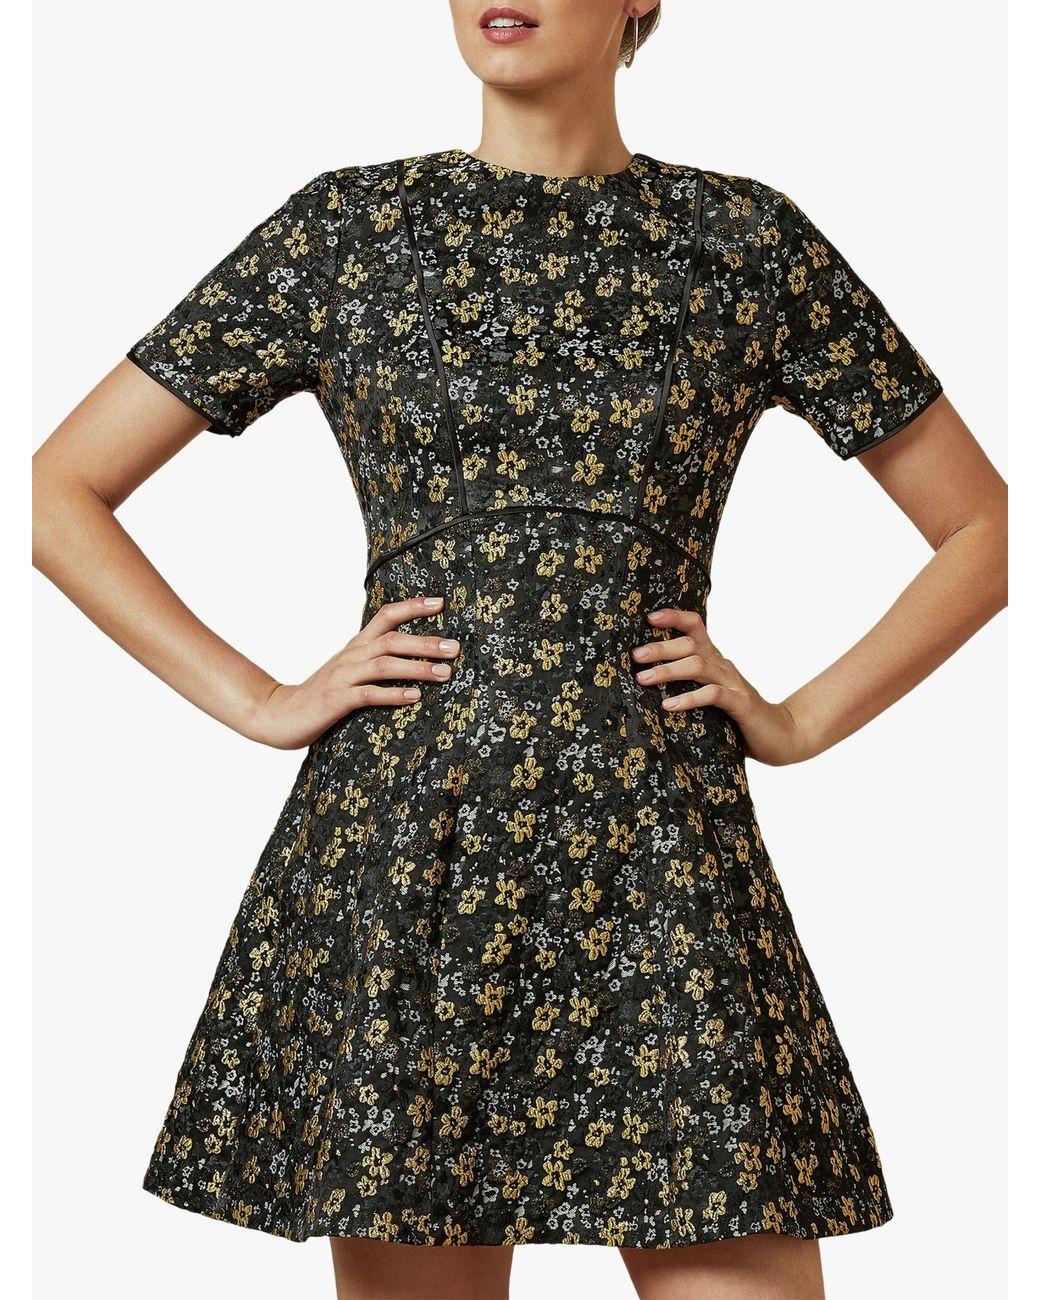 SALE NEW Ted Baker Moven Oriental Floral Print Skater Prom Dress £169 Black